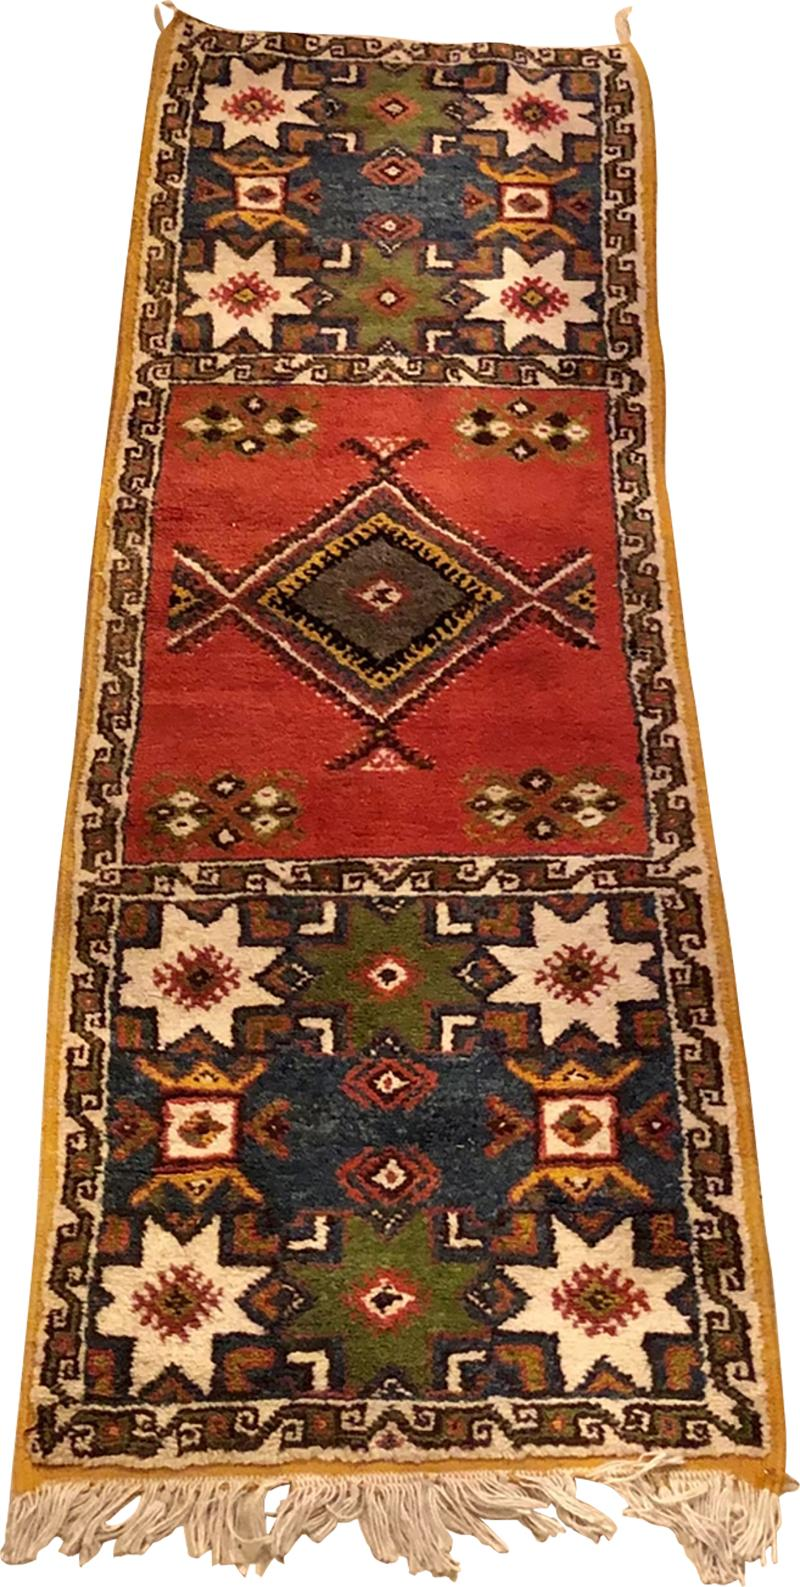 Atlas Showroom Berber Tribal Moroccan Multicolor Wool Runner Rug